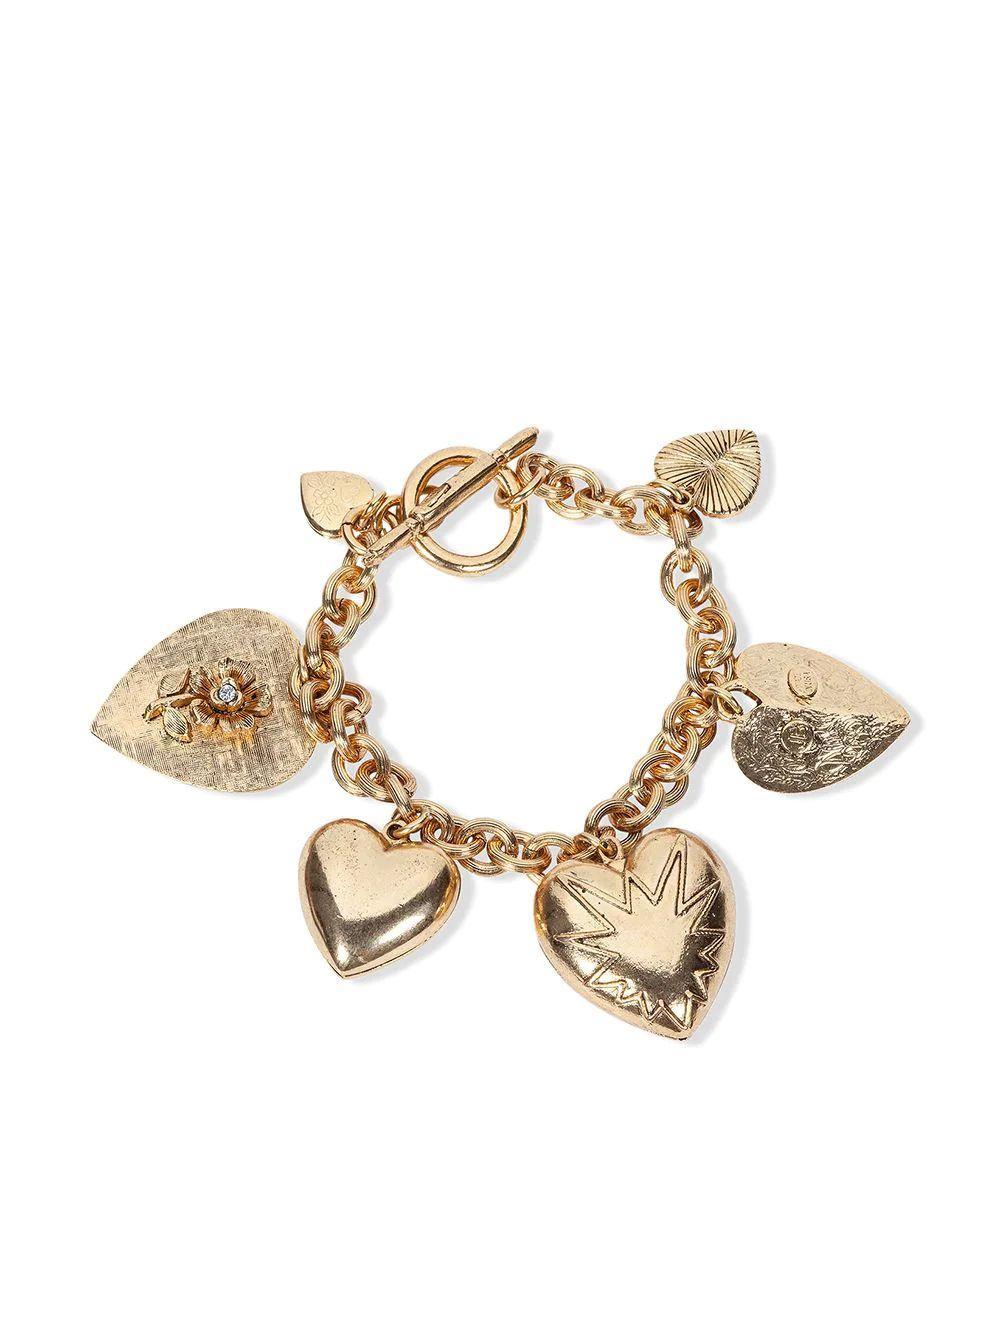 Avila Heart Bracelet Item # 111QC5